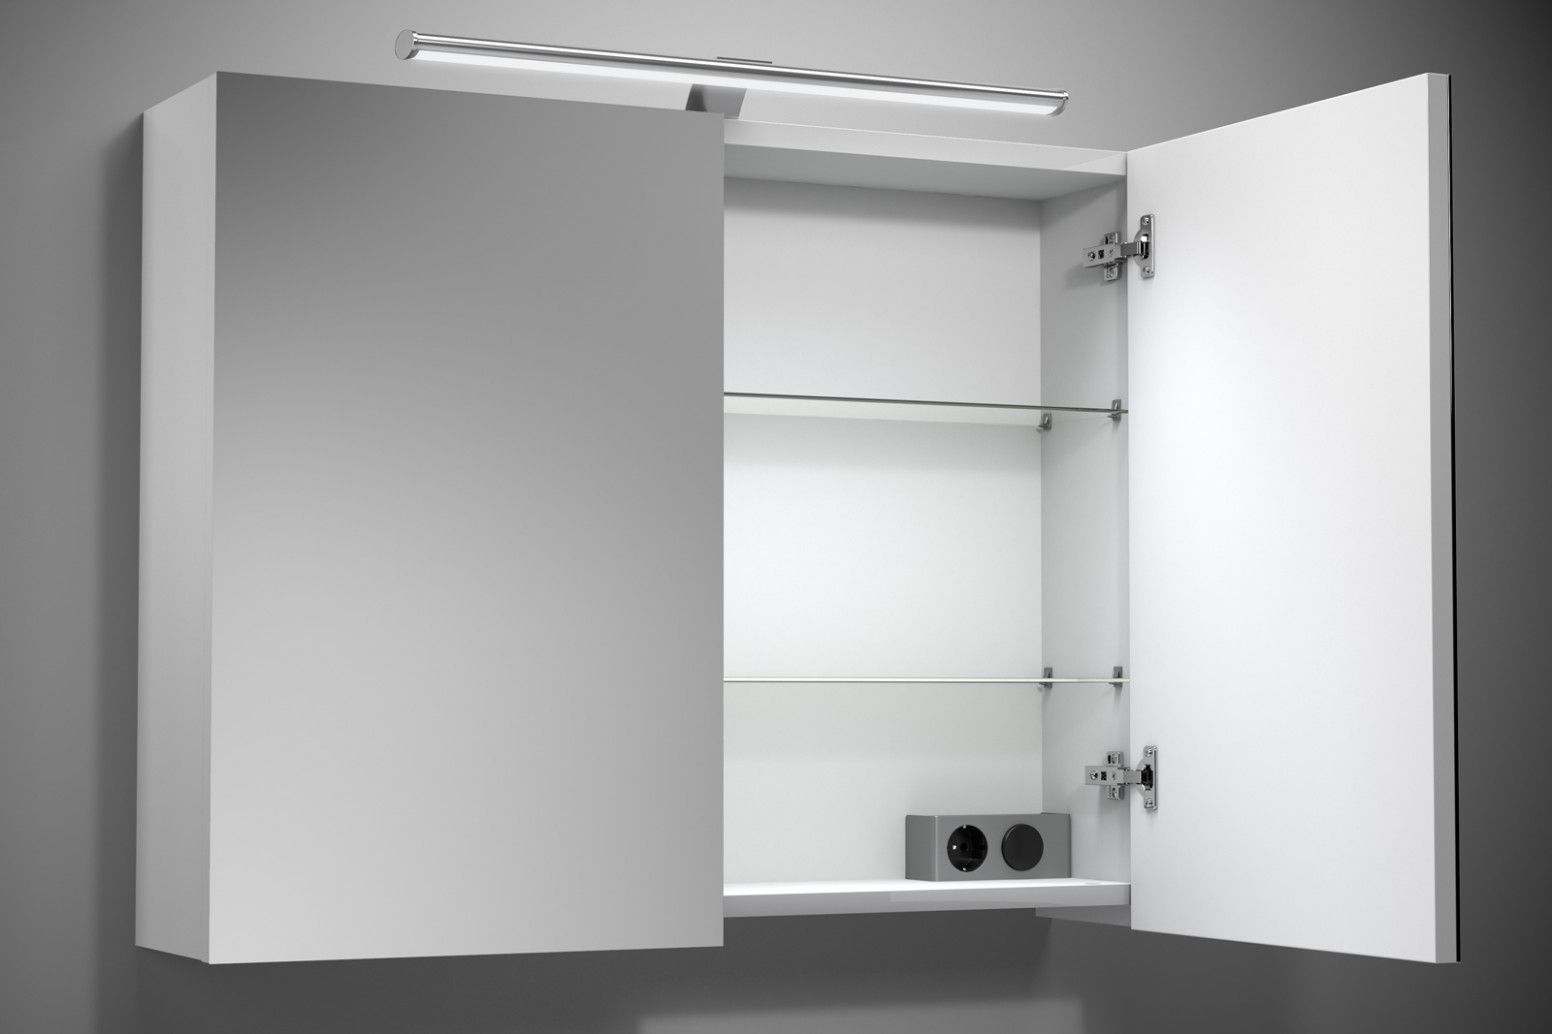 Badezimmer Spiegelschrank Beleuchtung Lampe 12 Cm Badezimmerschrank Beleuchtung Check Mor Badezimmer Spiegelschrank Spiegelschrank Spiegelschrank Beleuchtung